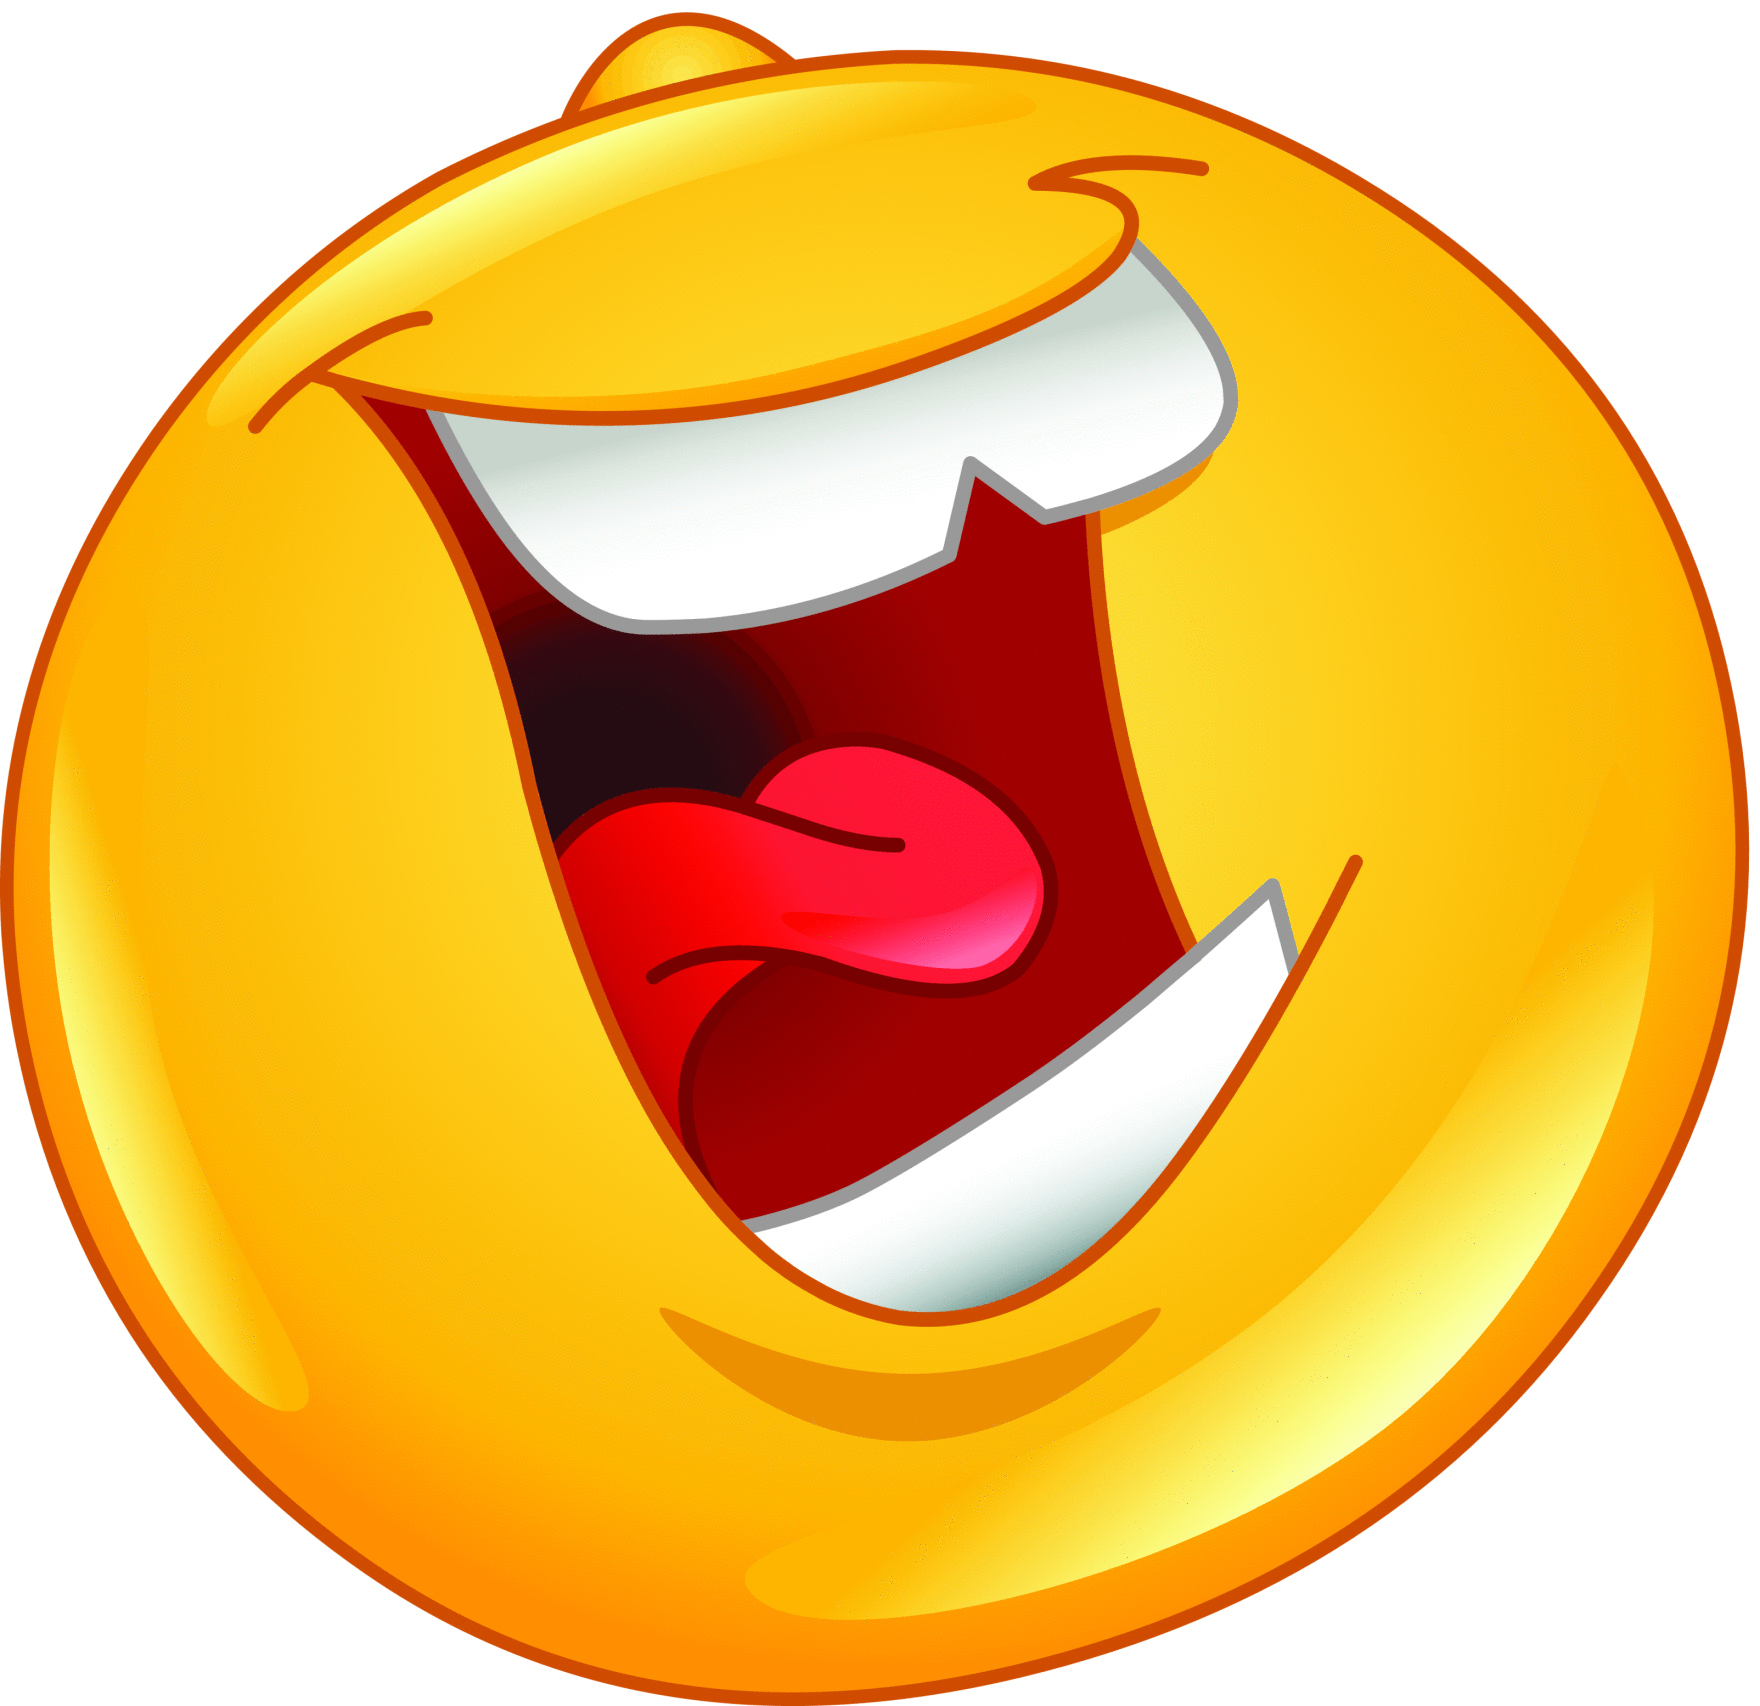 Laughing Clip Art - ClipArt Best